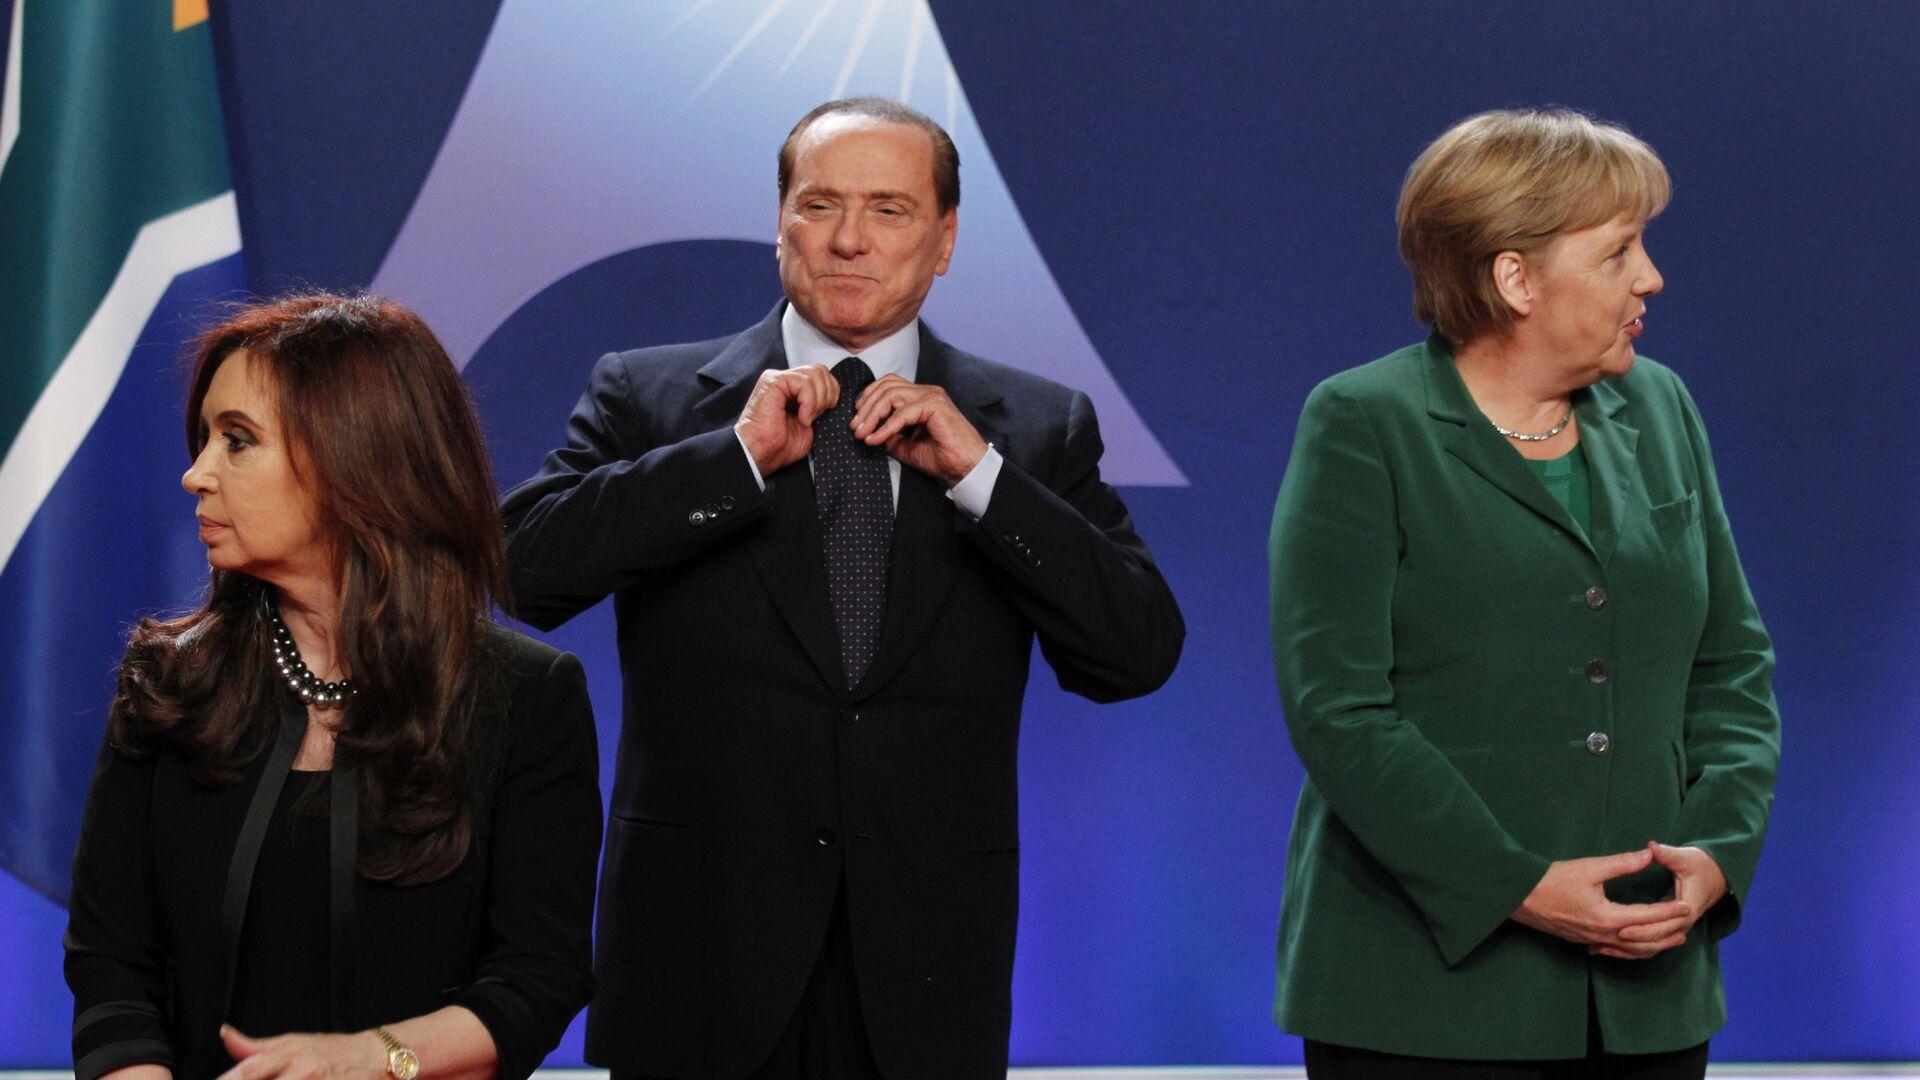 Berlusconi e Angela Merkel al G20 di Cannes del 2011 - Sputnik Italia, 1920, 27.09.2021